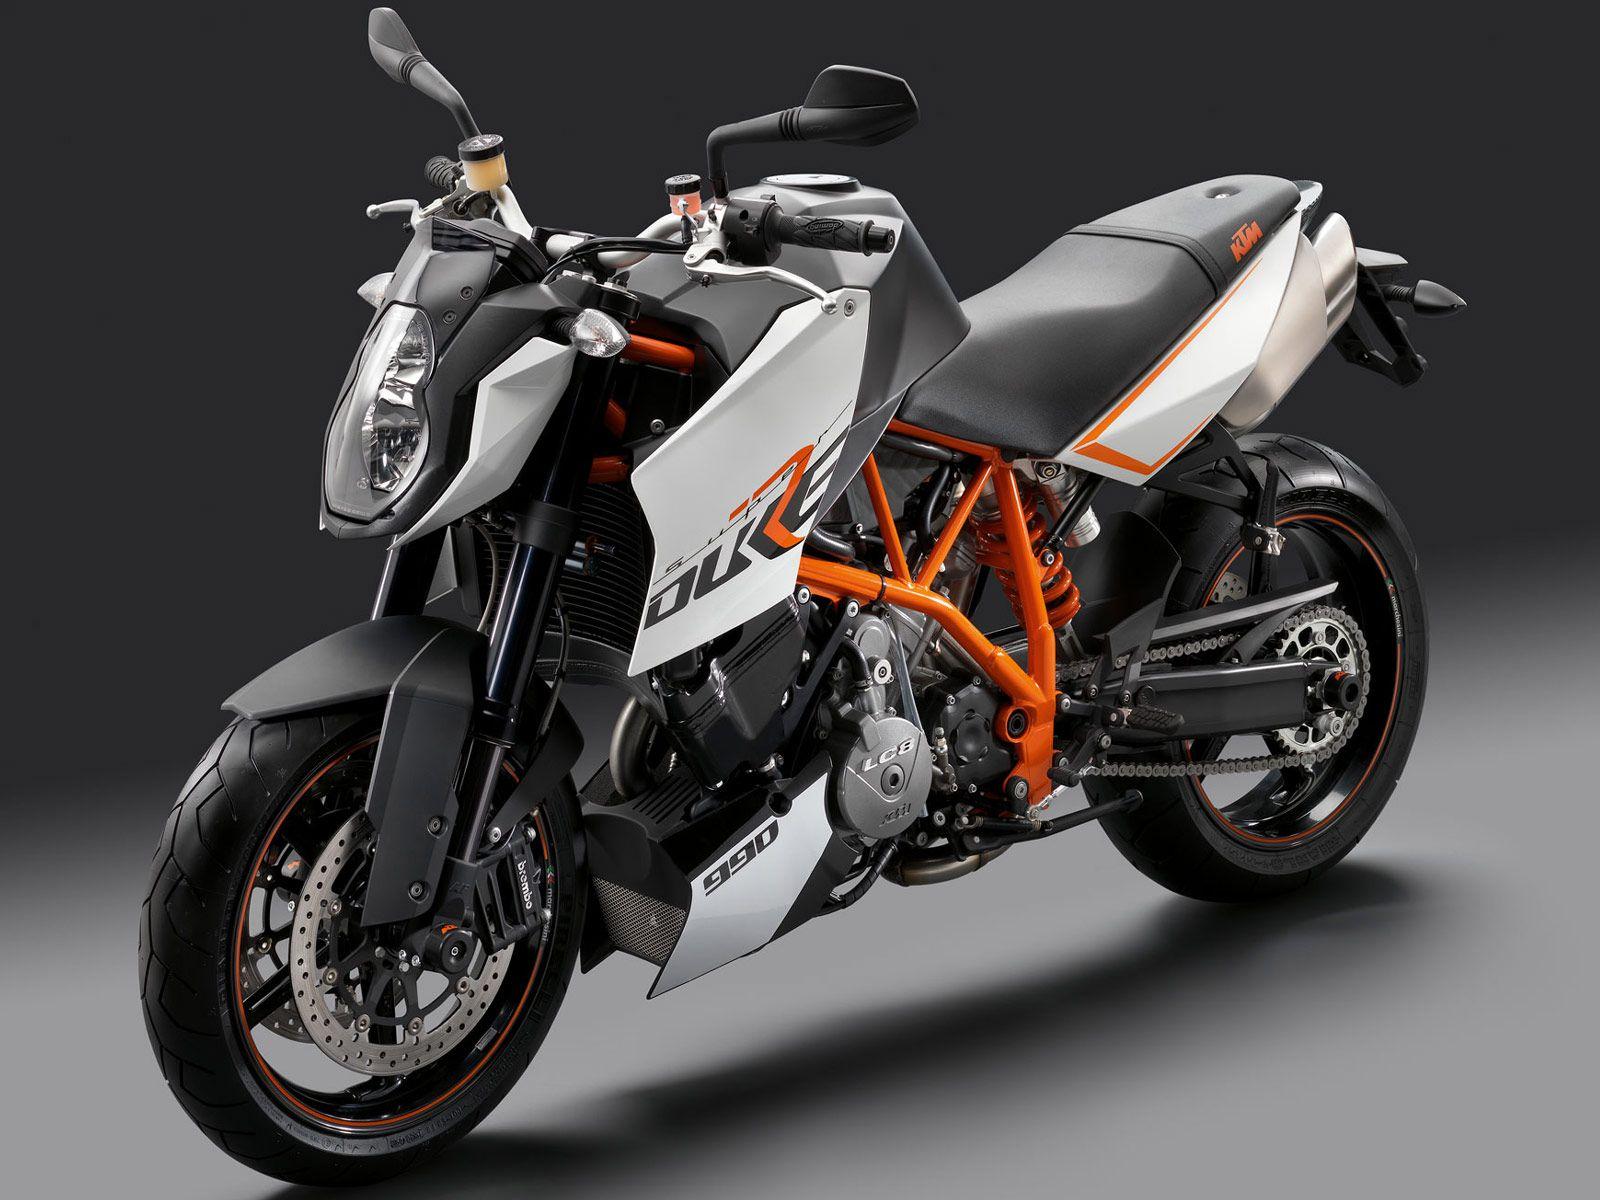 KTM 990 Super Duke R Bikes Ktm motorcycles, Ktm super